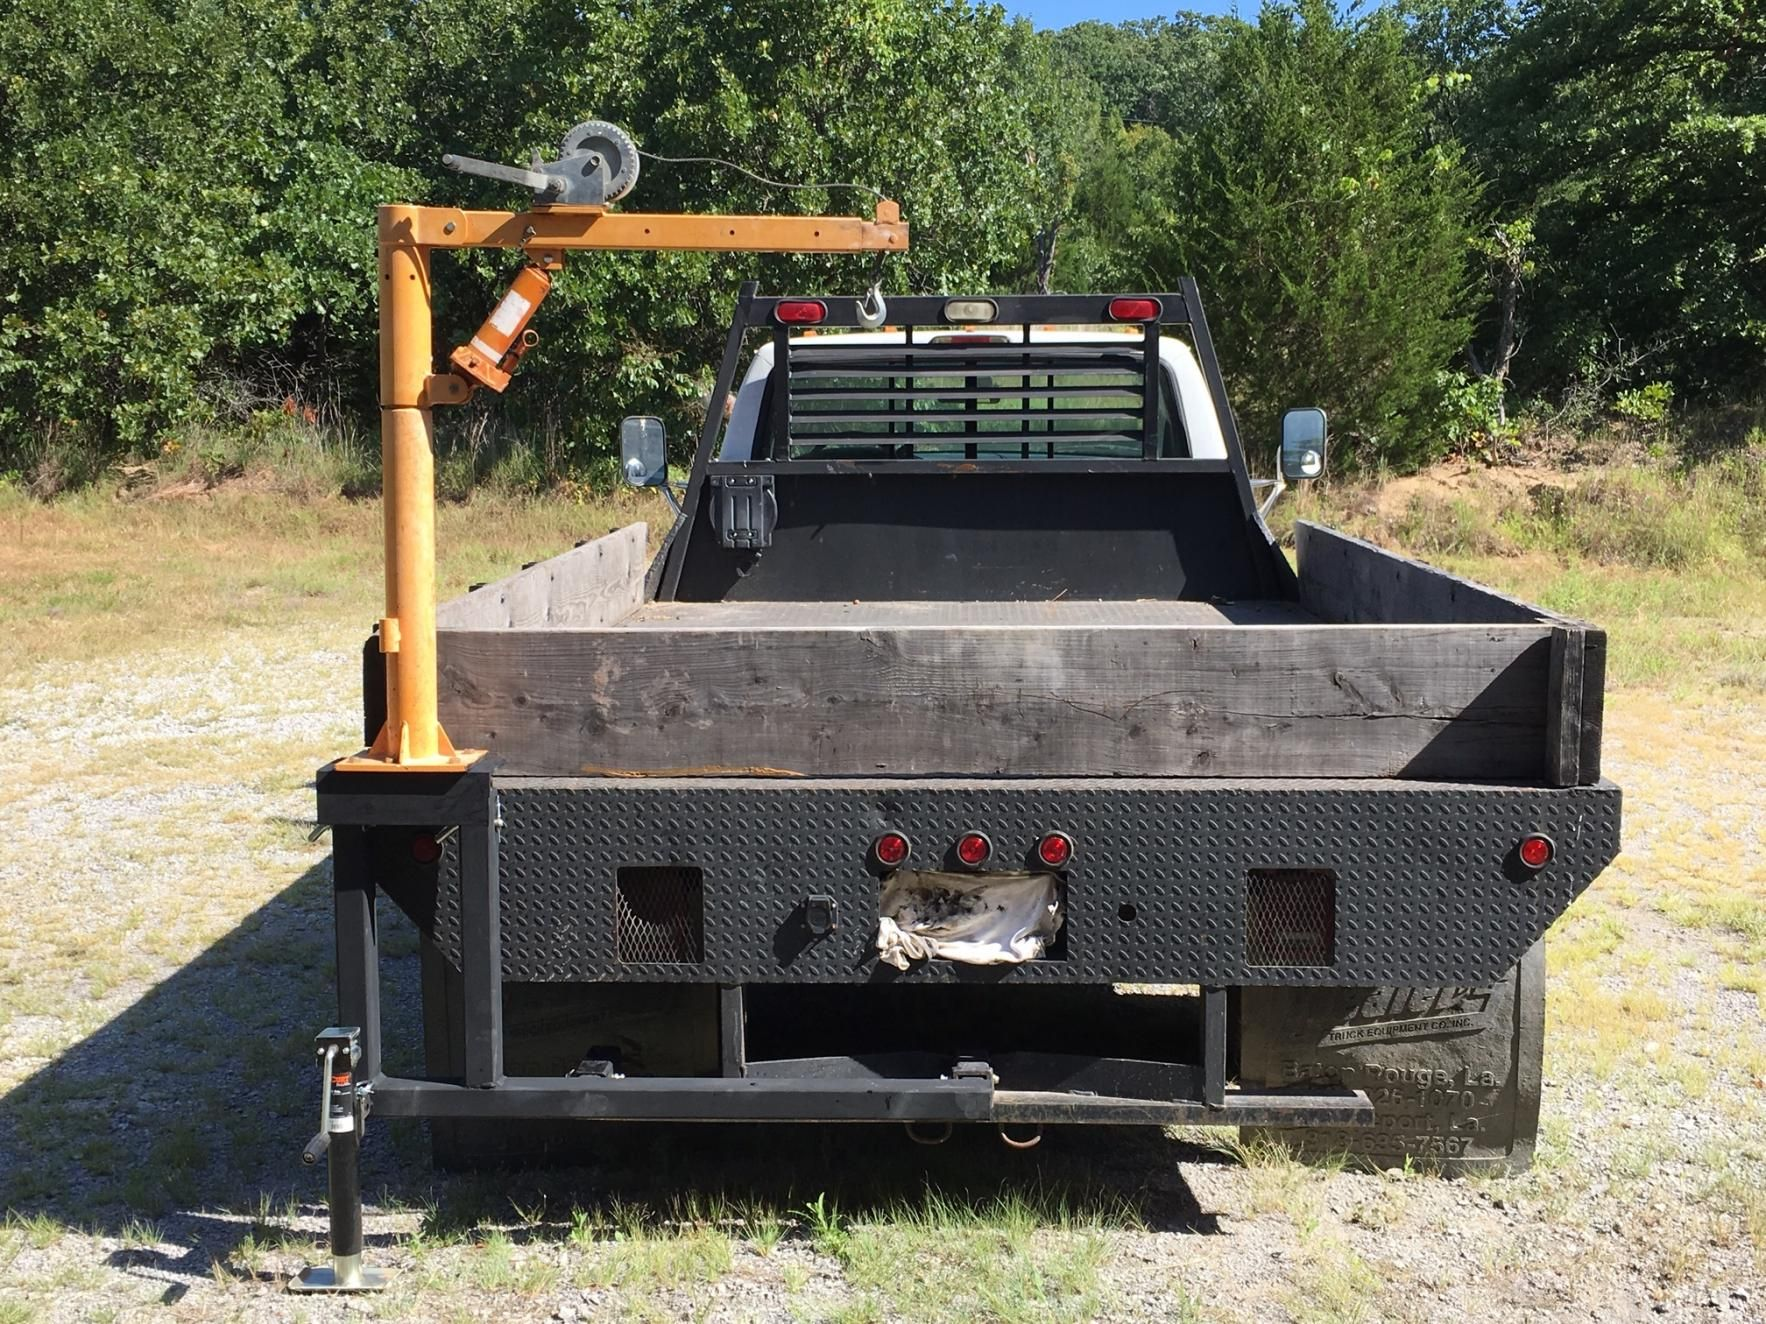 Harbor Freight Jib Crane Mounts Truck And Shop By Viny So I